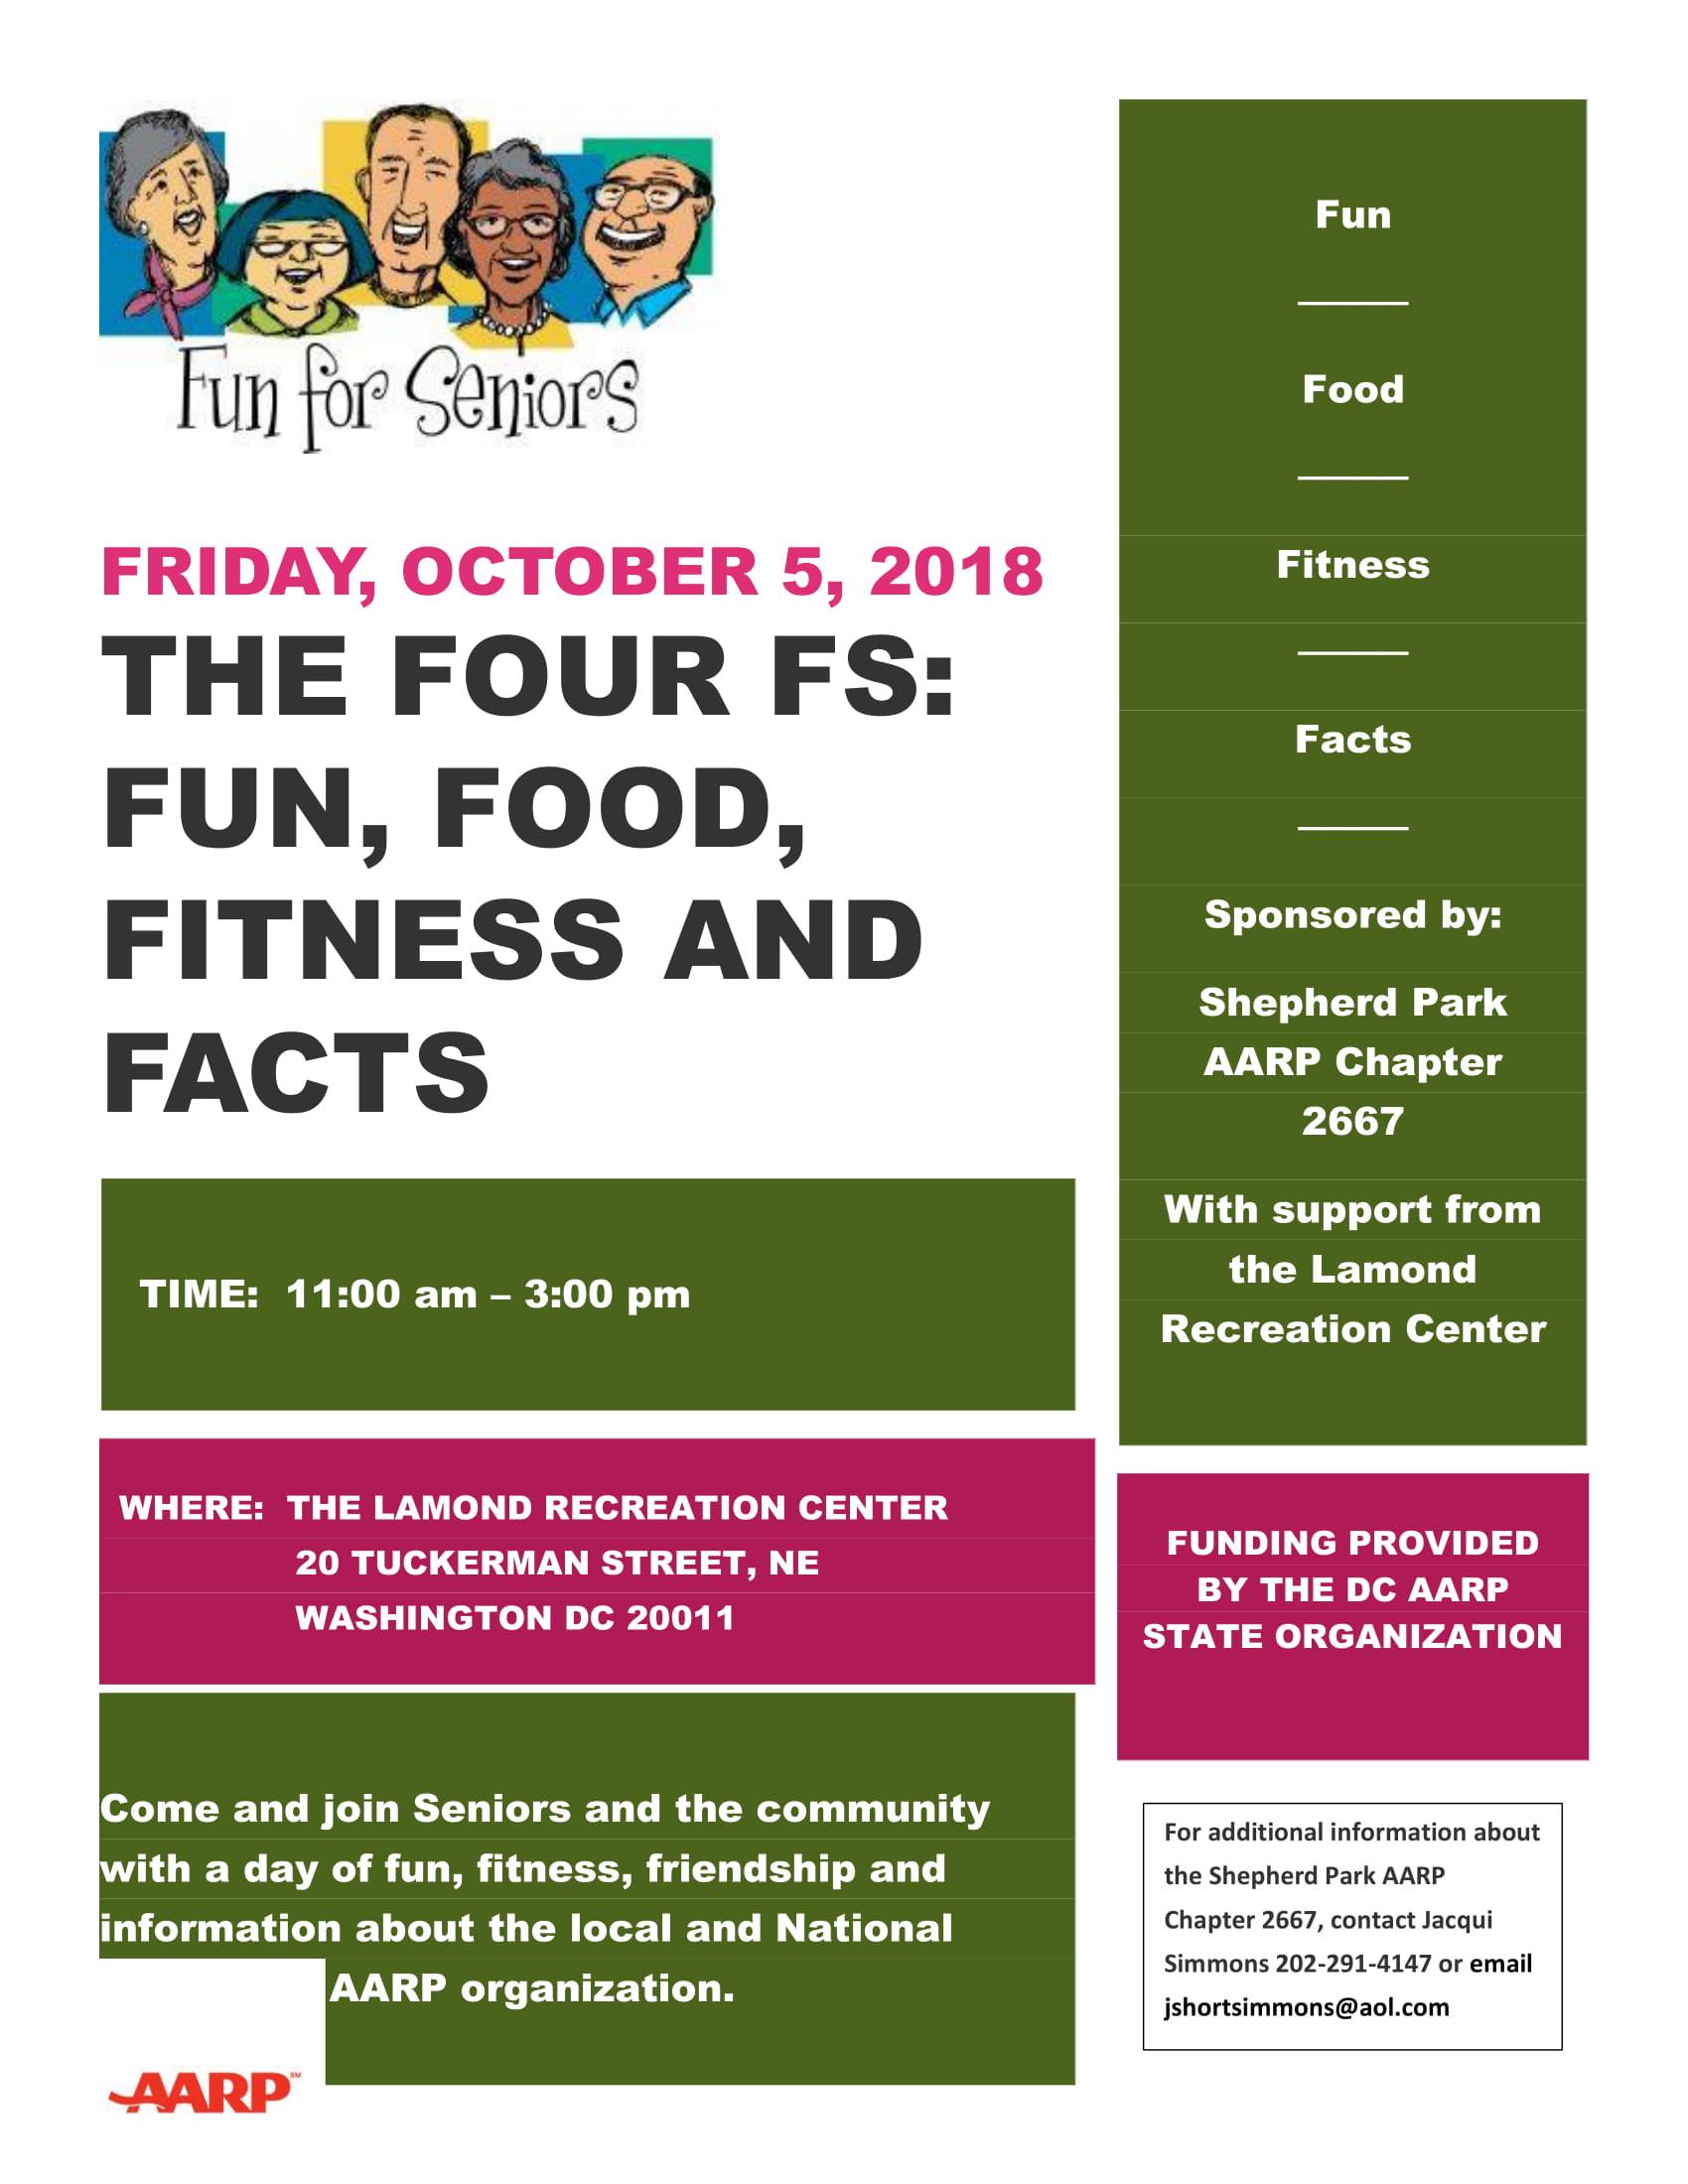 AARP Fun Food Fitness  Facts-1.jpg